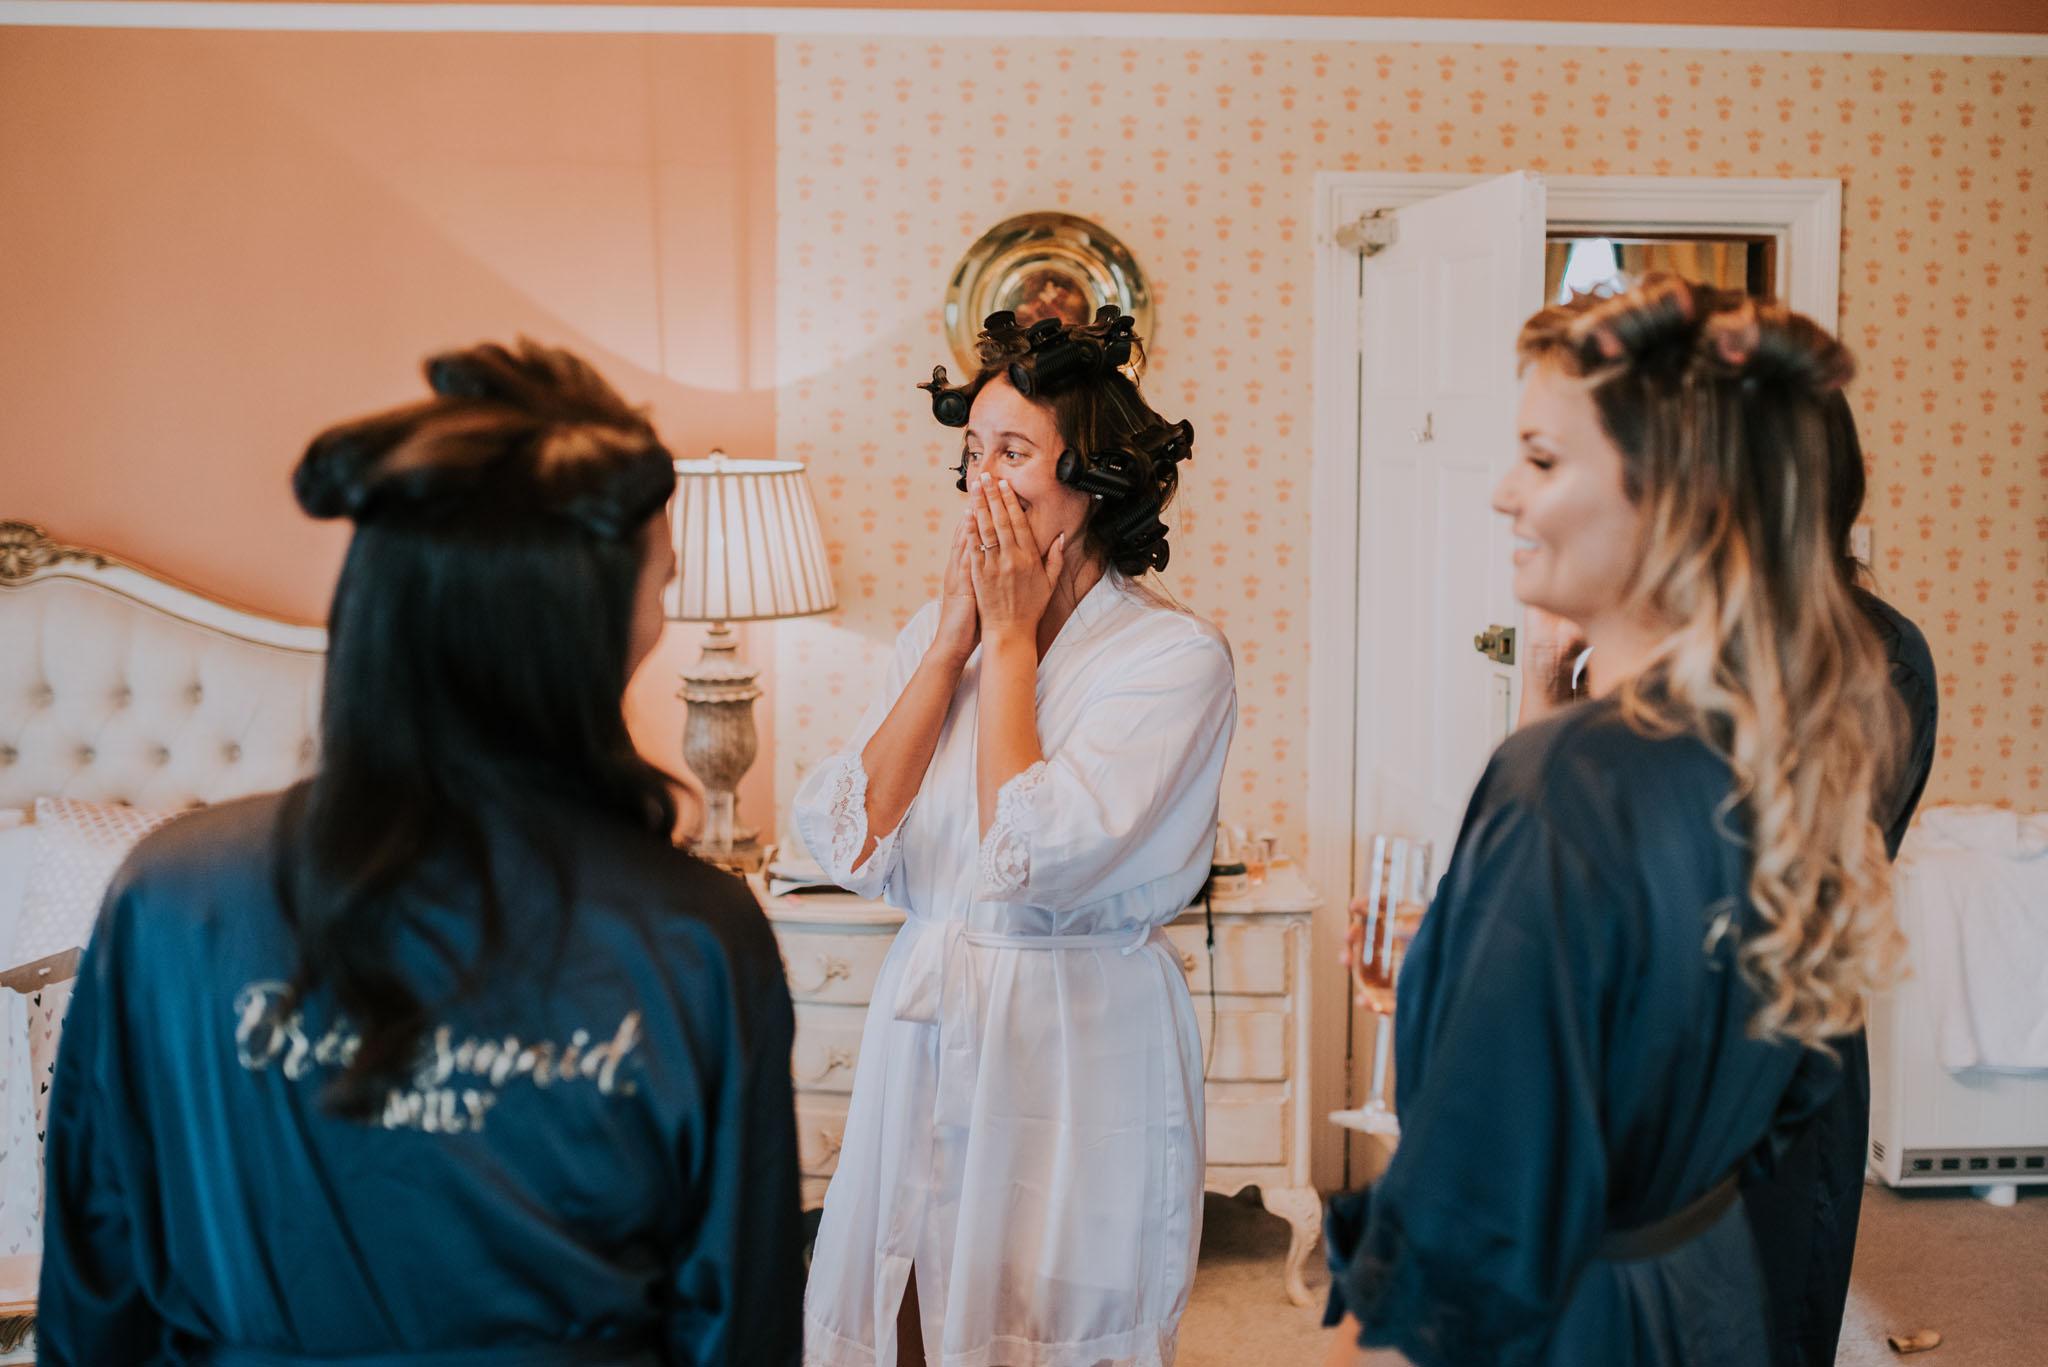 wedding-photographer-glewstone-court-hereford-scott-stockwell-photography050.jpg